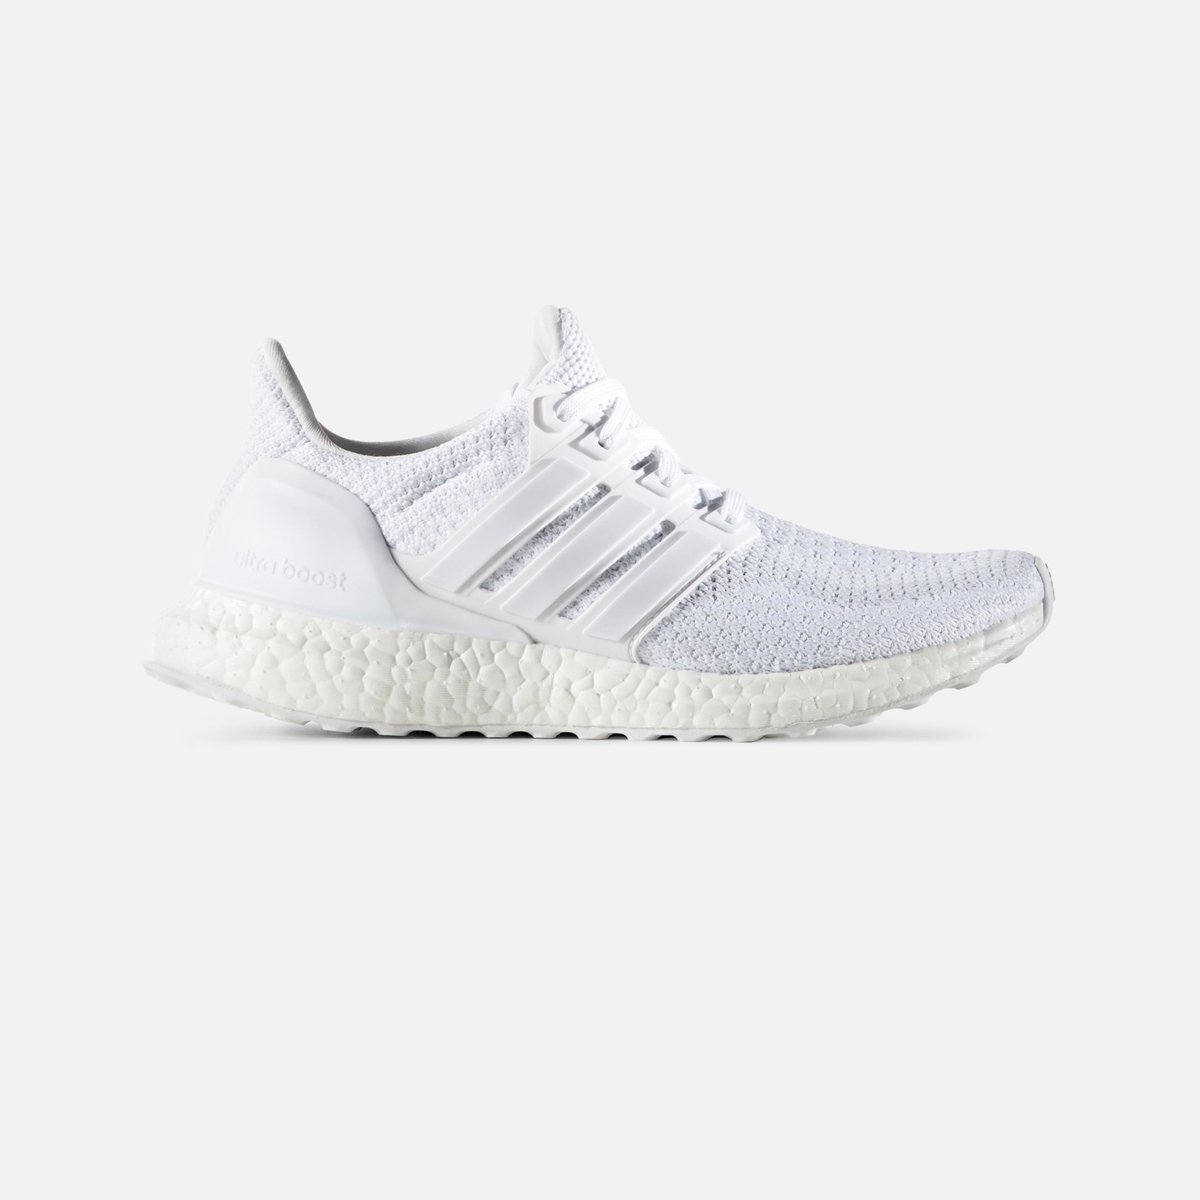 88dbae749 ... good adidas ultra boost grade school running white running white villa  f7e9d 12c76